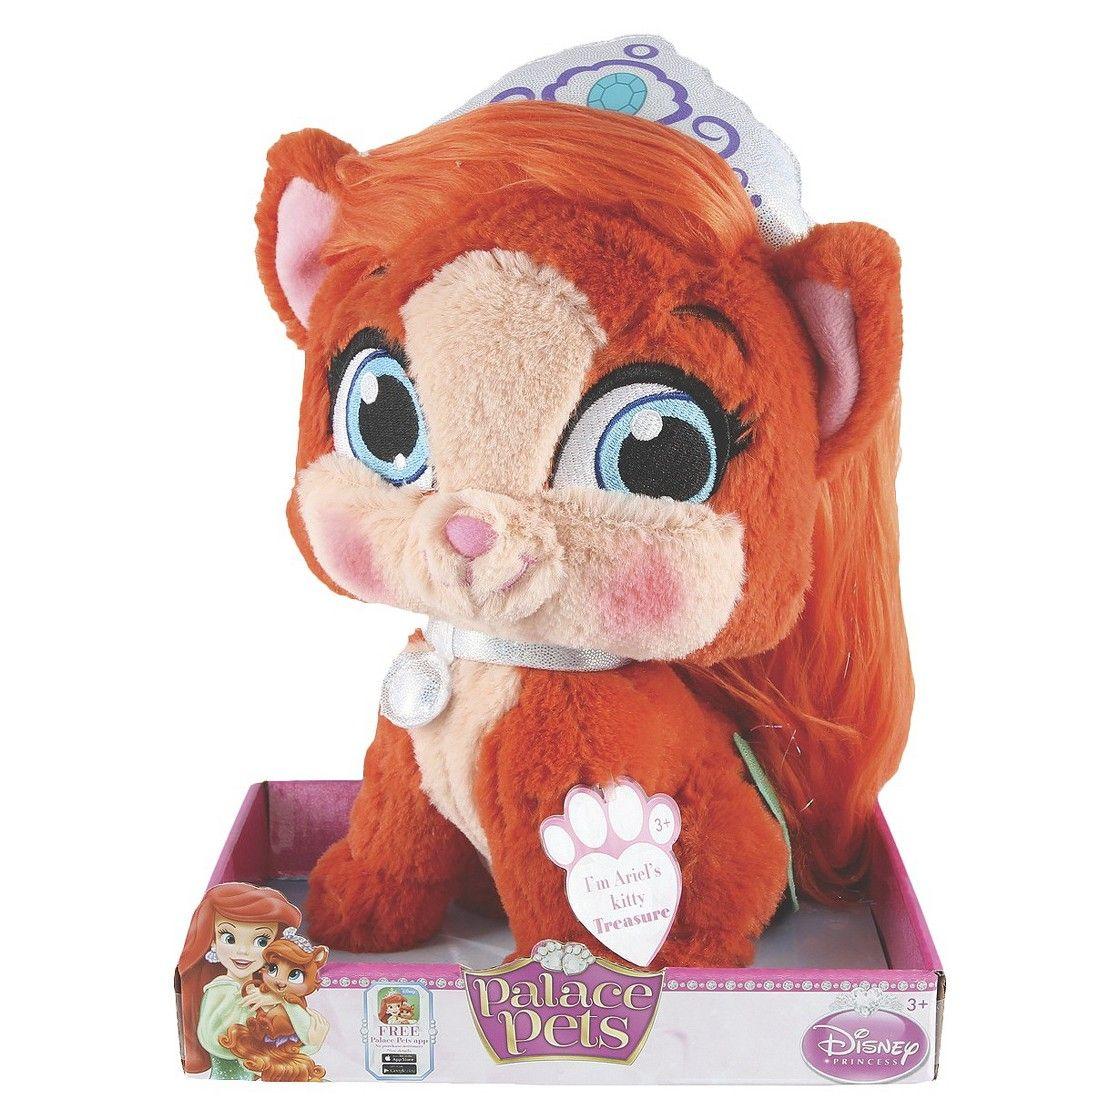 Disney Princess Palace Pets Ariel S Kitty Treasure Large Plush Toy Palace Pets Large Plush Toys Disney Princess Palace Pets